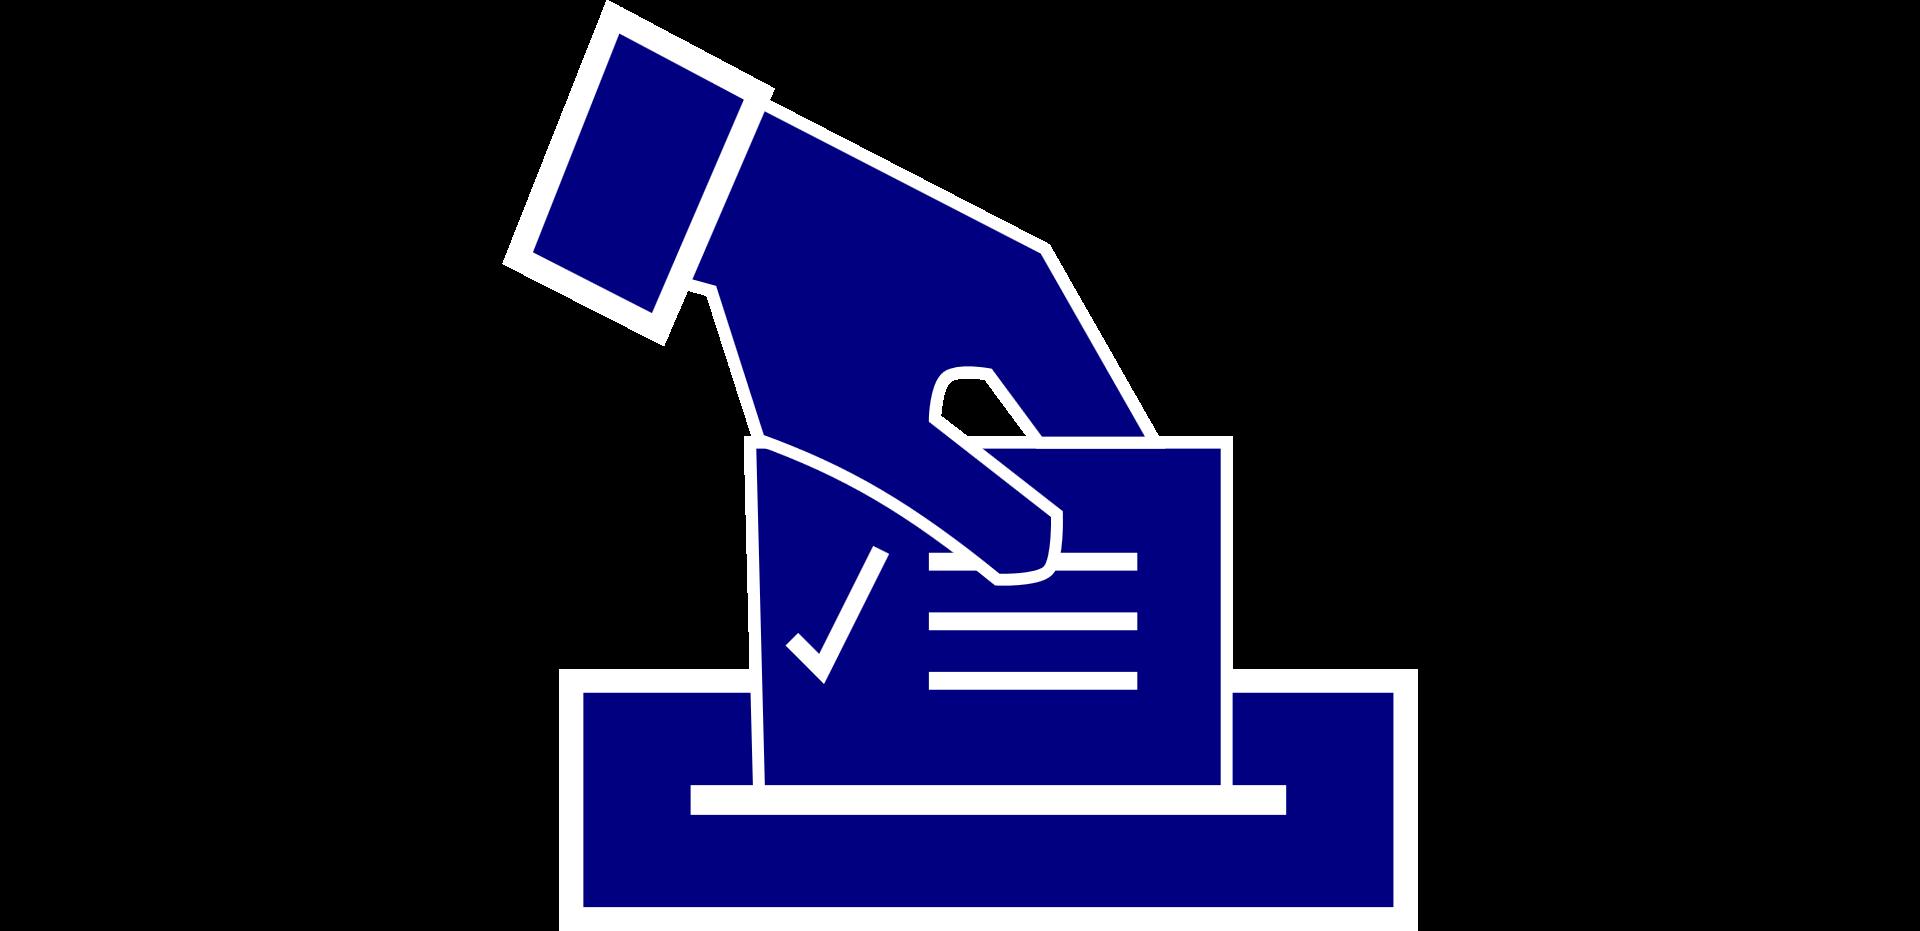 Democracy clipart voter registration, Democracy voter.